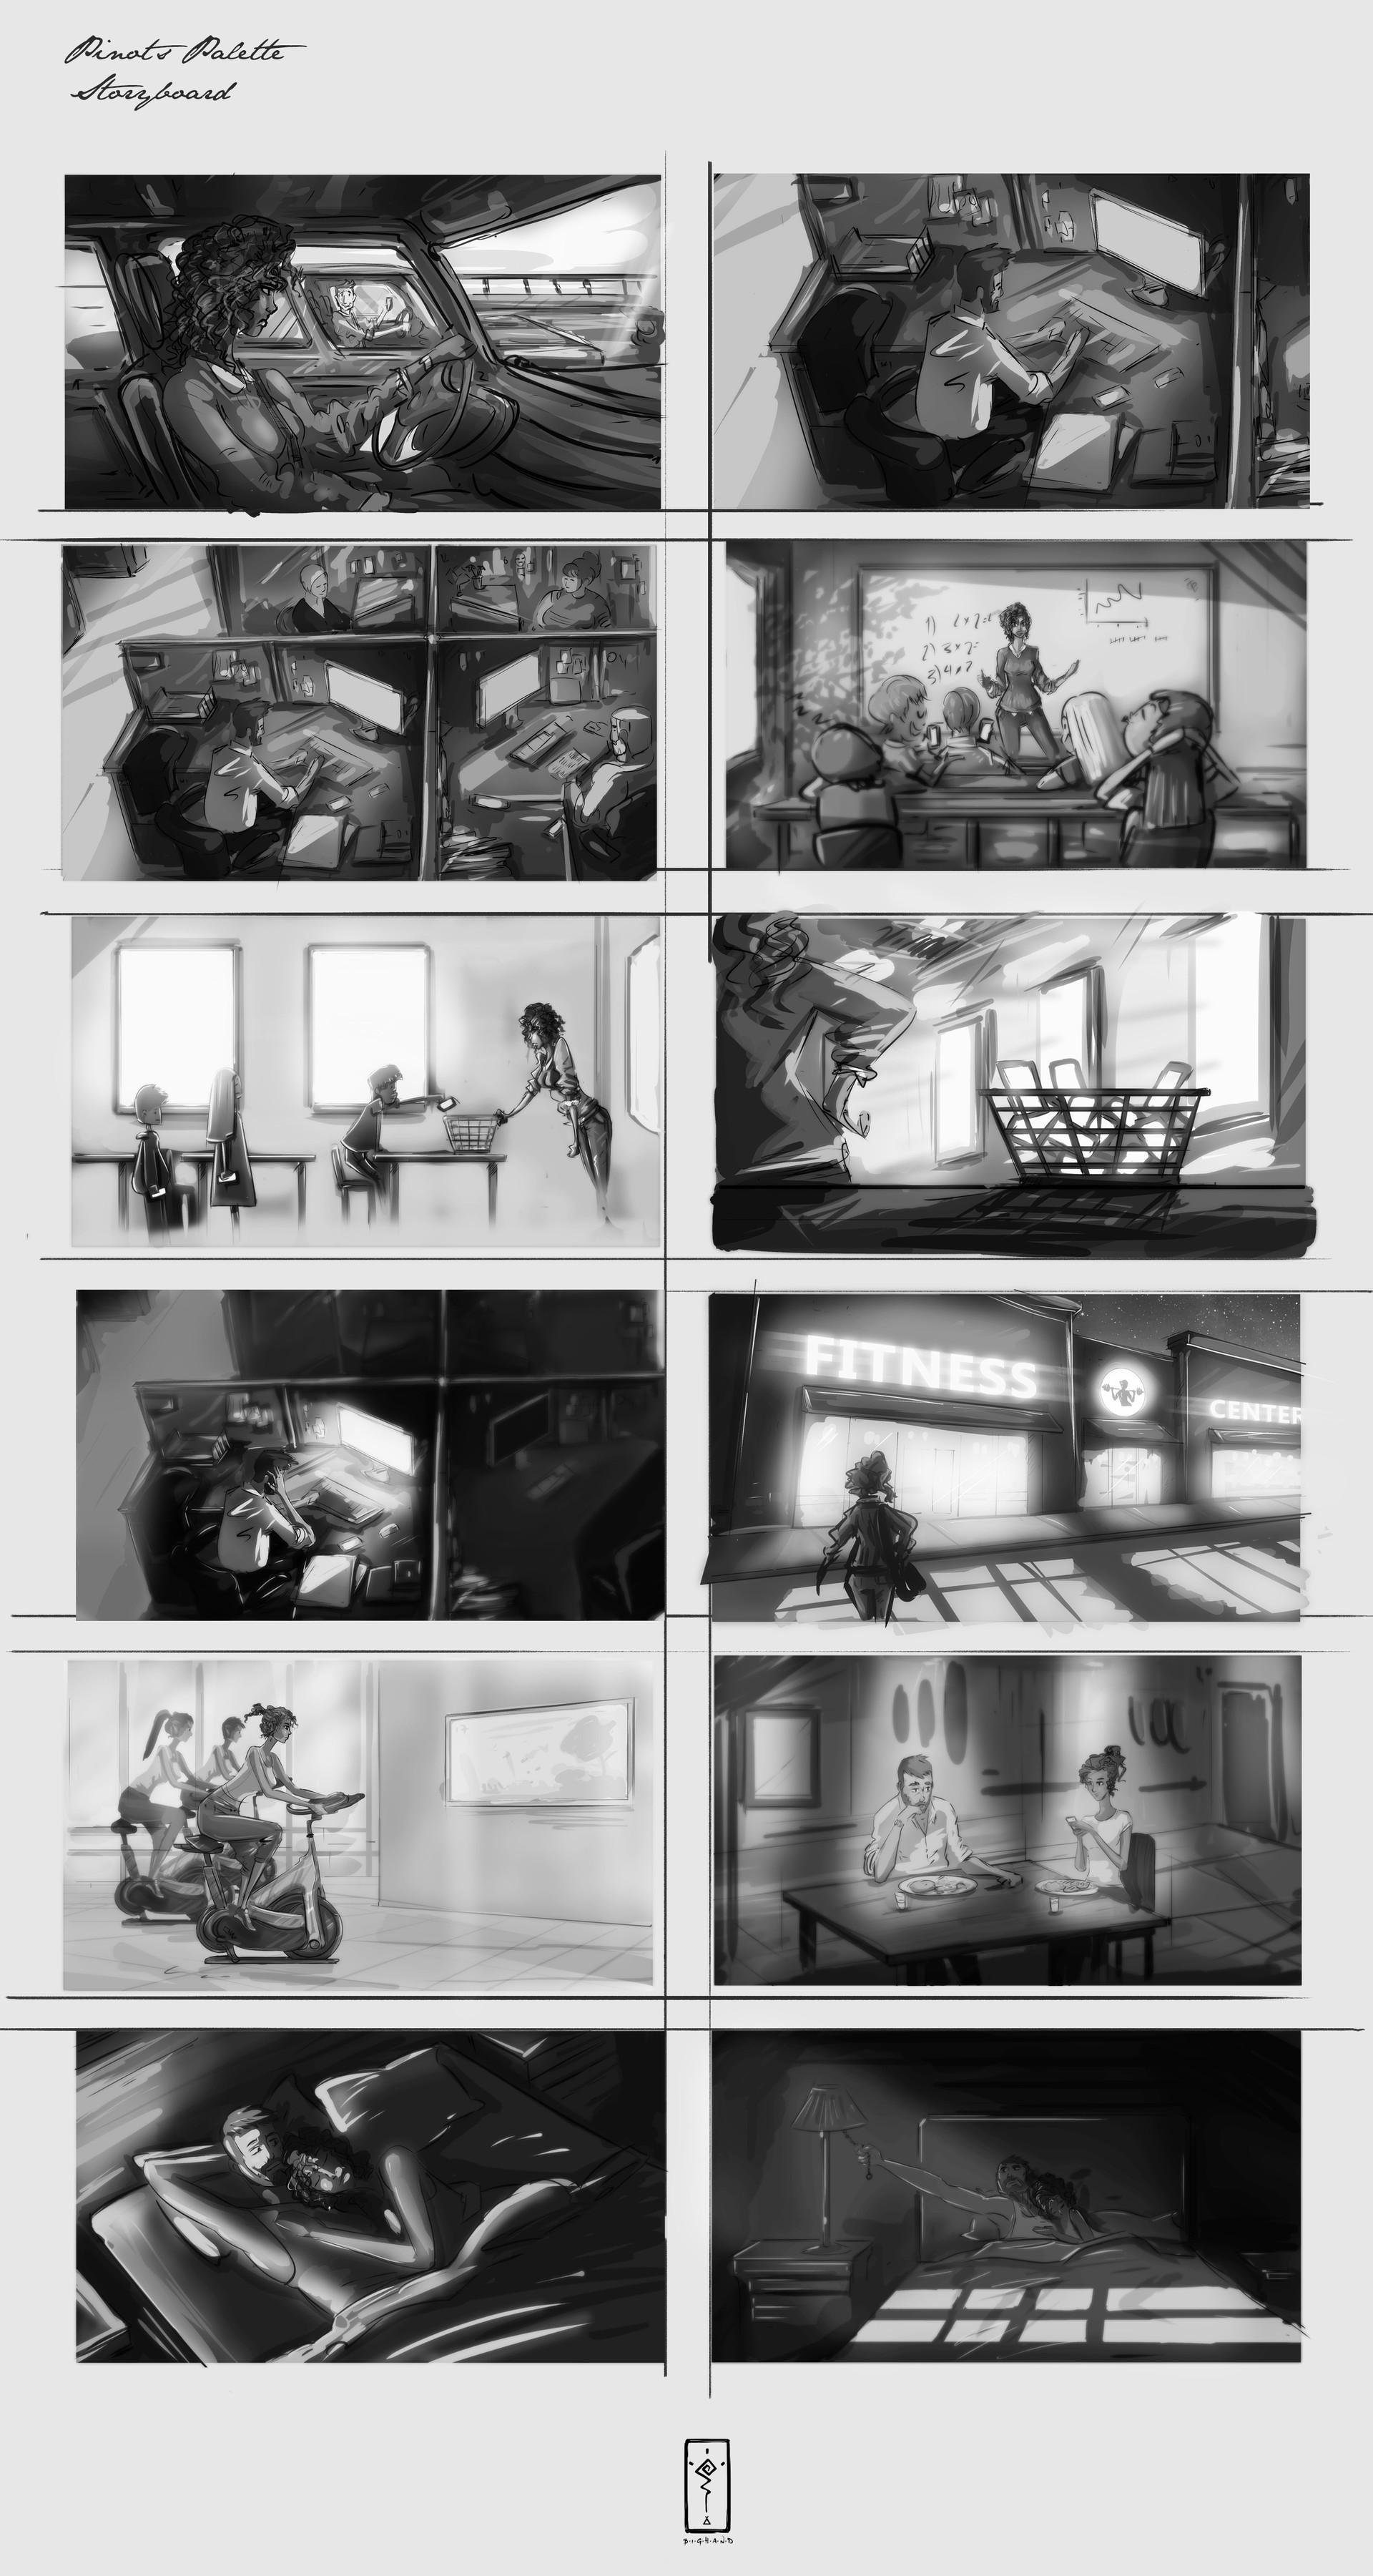 Christian benavides storyboard frames 22 32